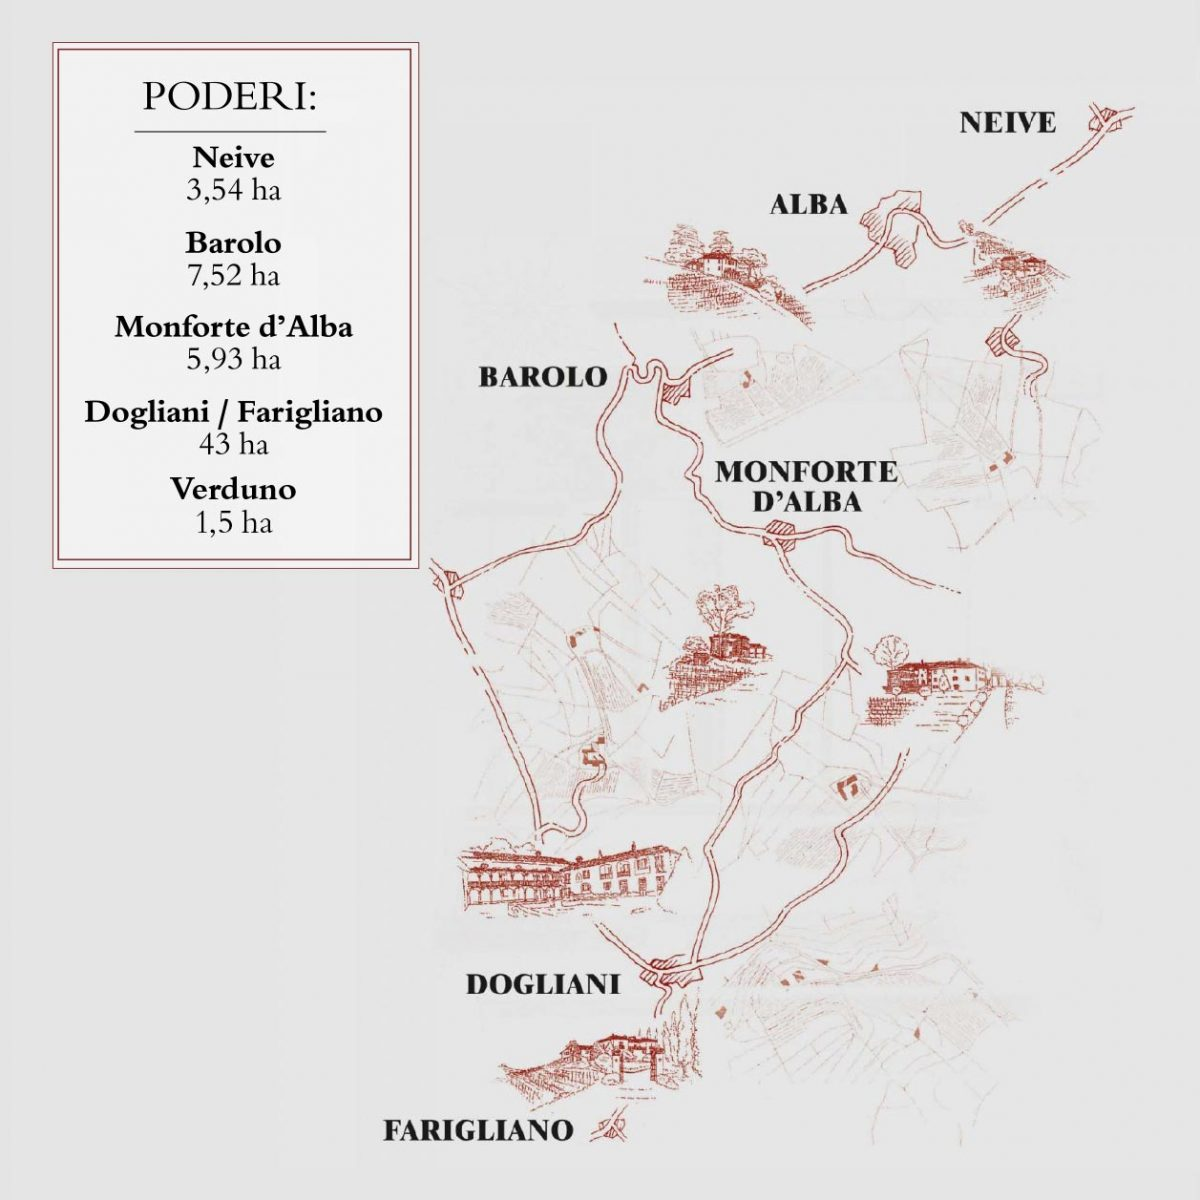 Mappa dei Poderi Einaudi